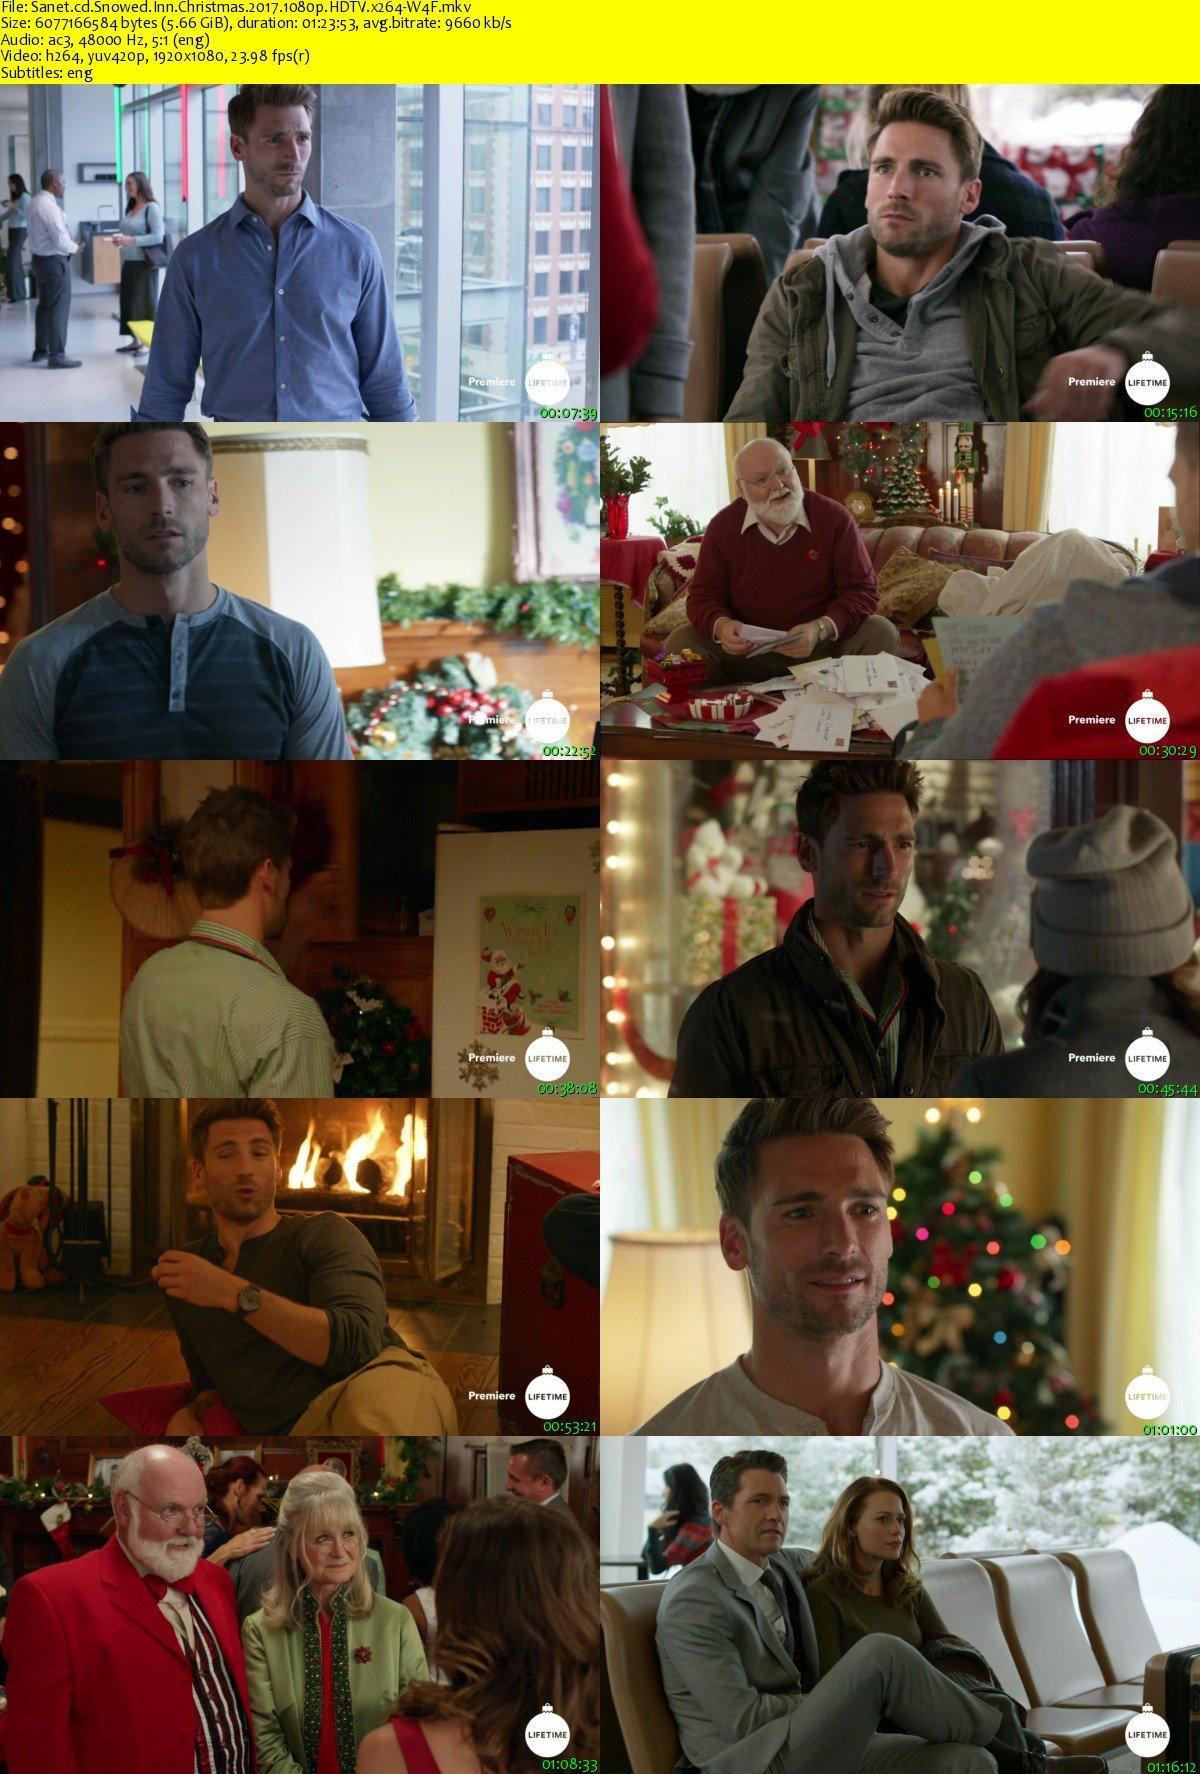 Snowed Inn Christmas.Download Snowed Inn Christmas 2017 1080p Hdtv X264 W4f